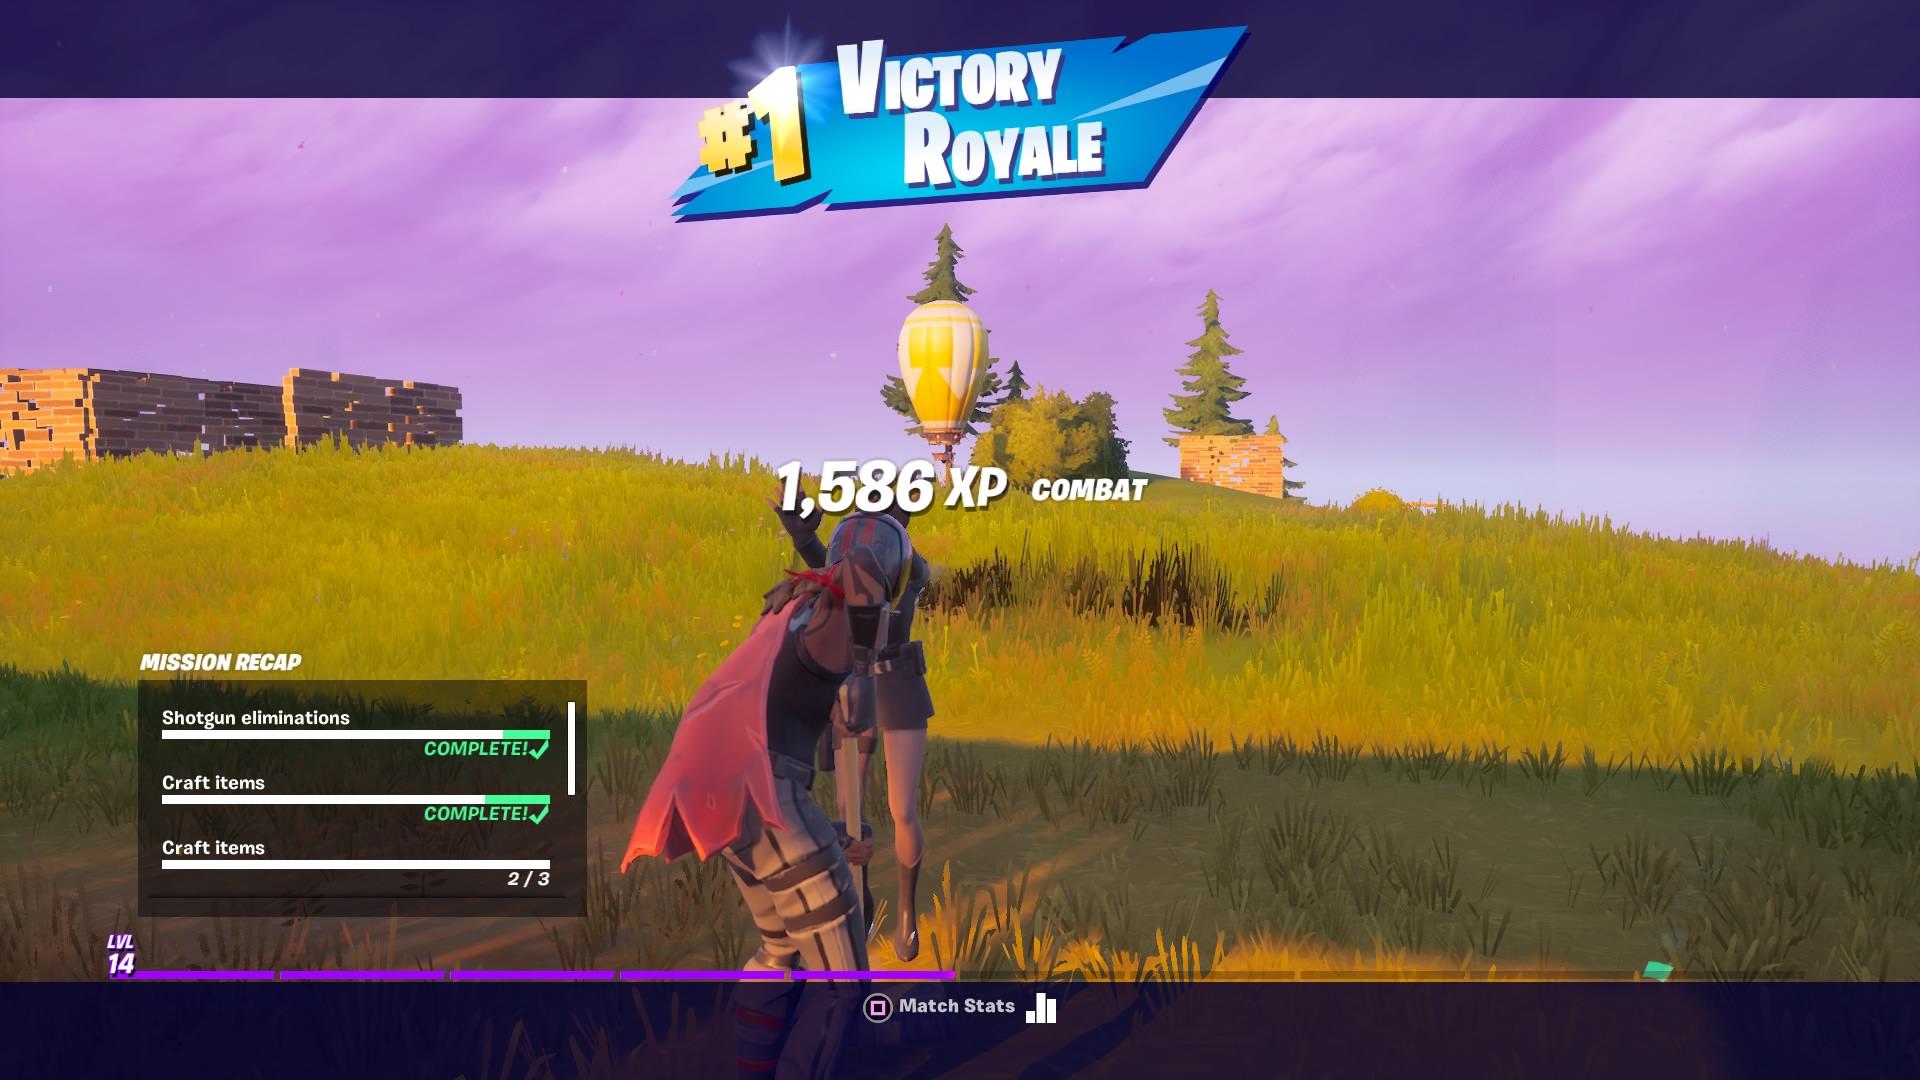 fortnite victory royale wallpaper 73922